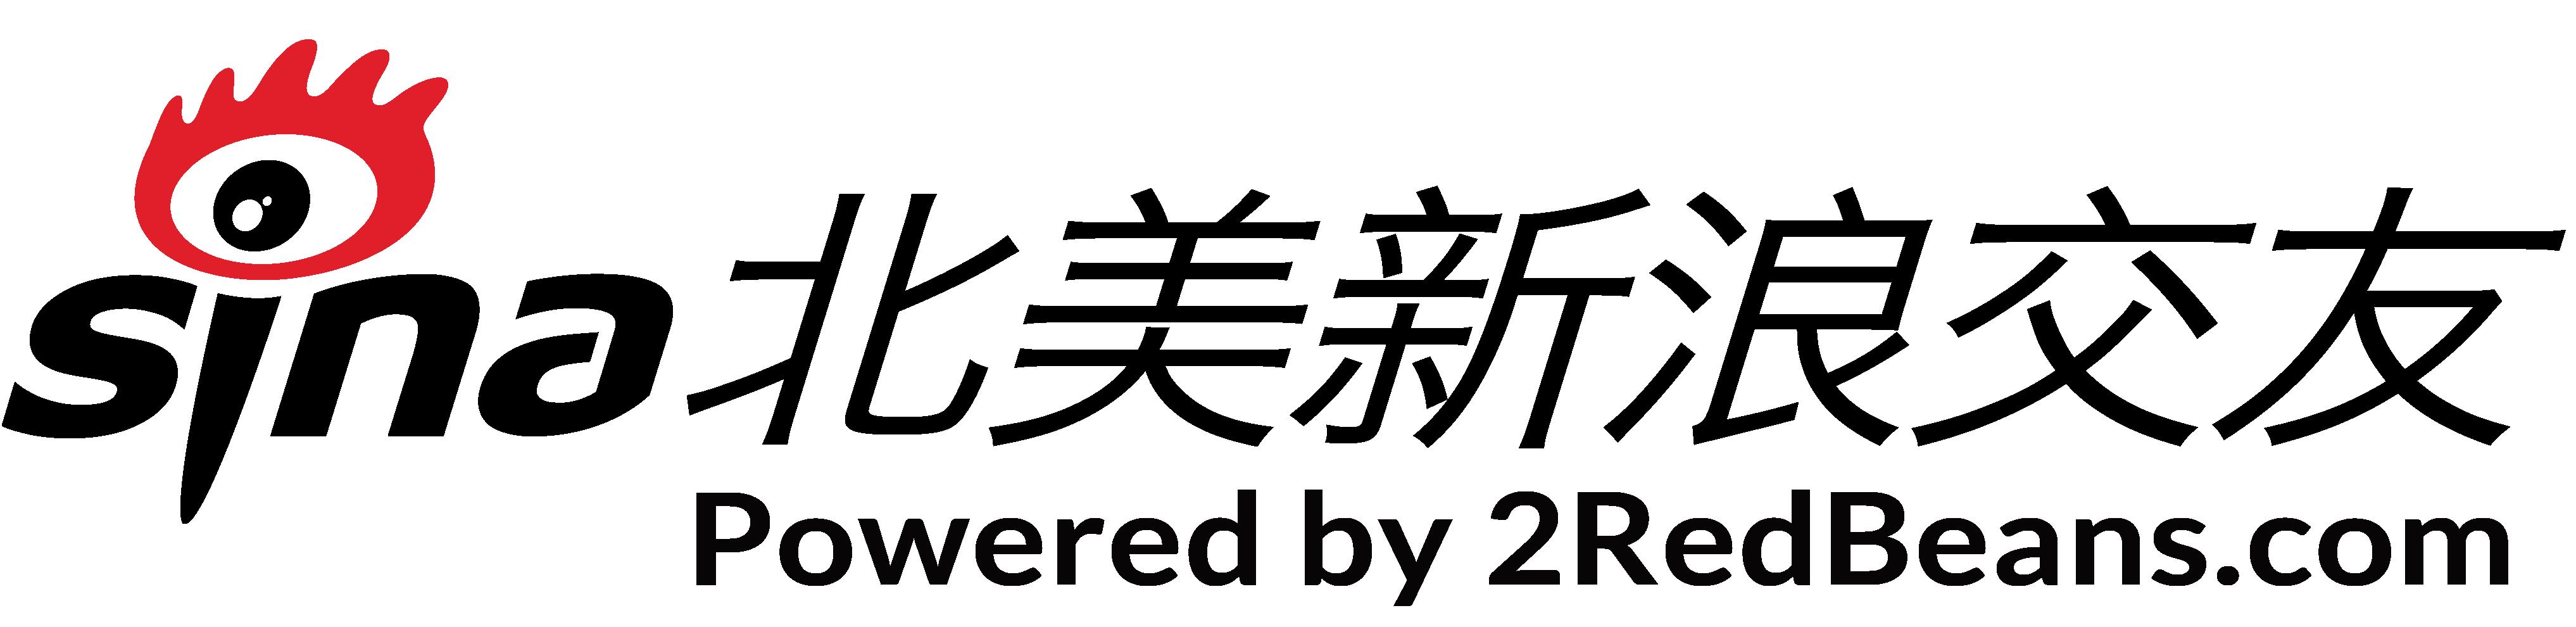 Sina logo black